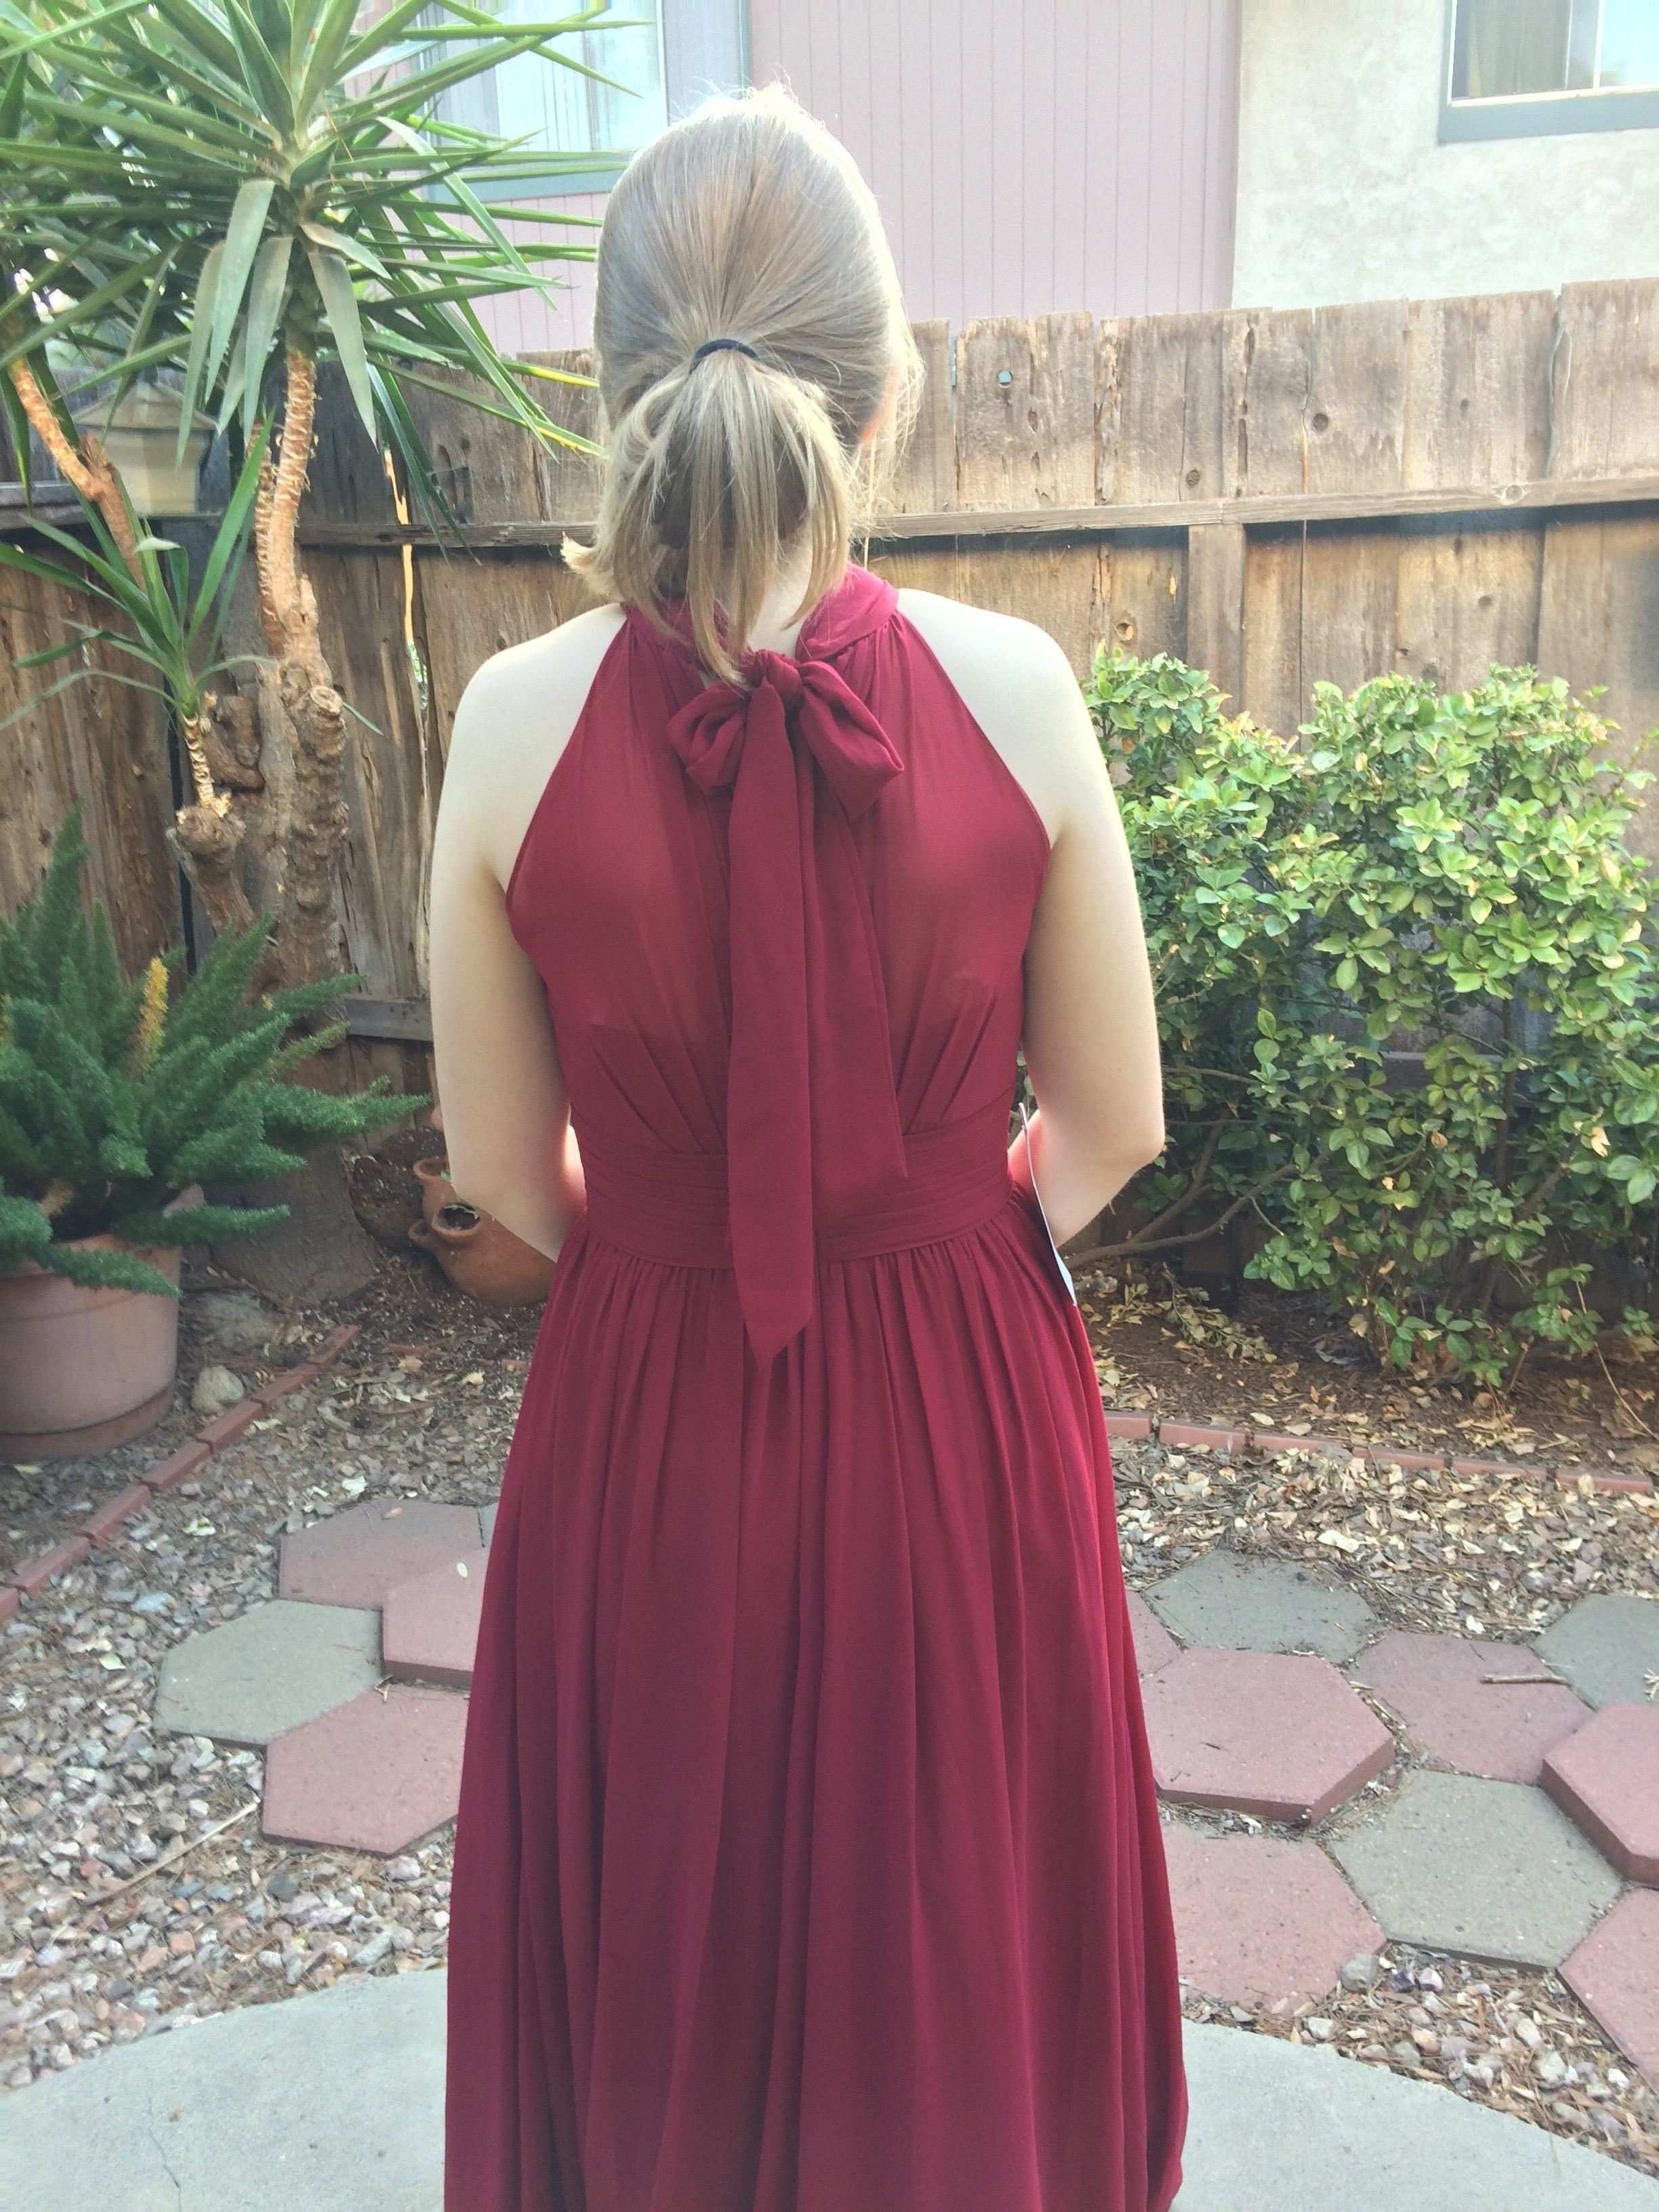 Azazie Iman Bridesmaid Dress | Azazie - photo #41